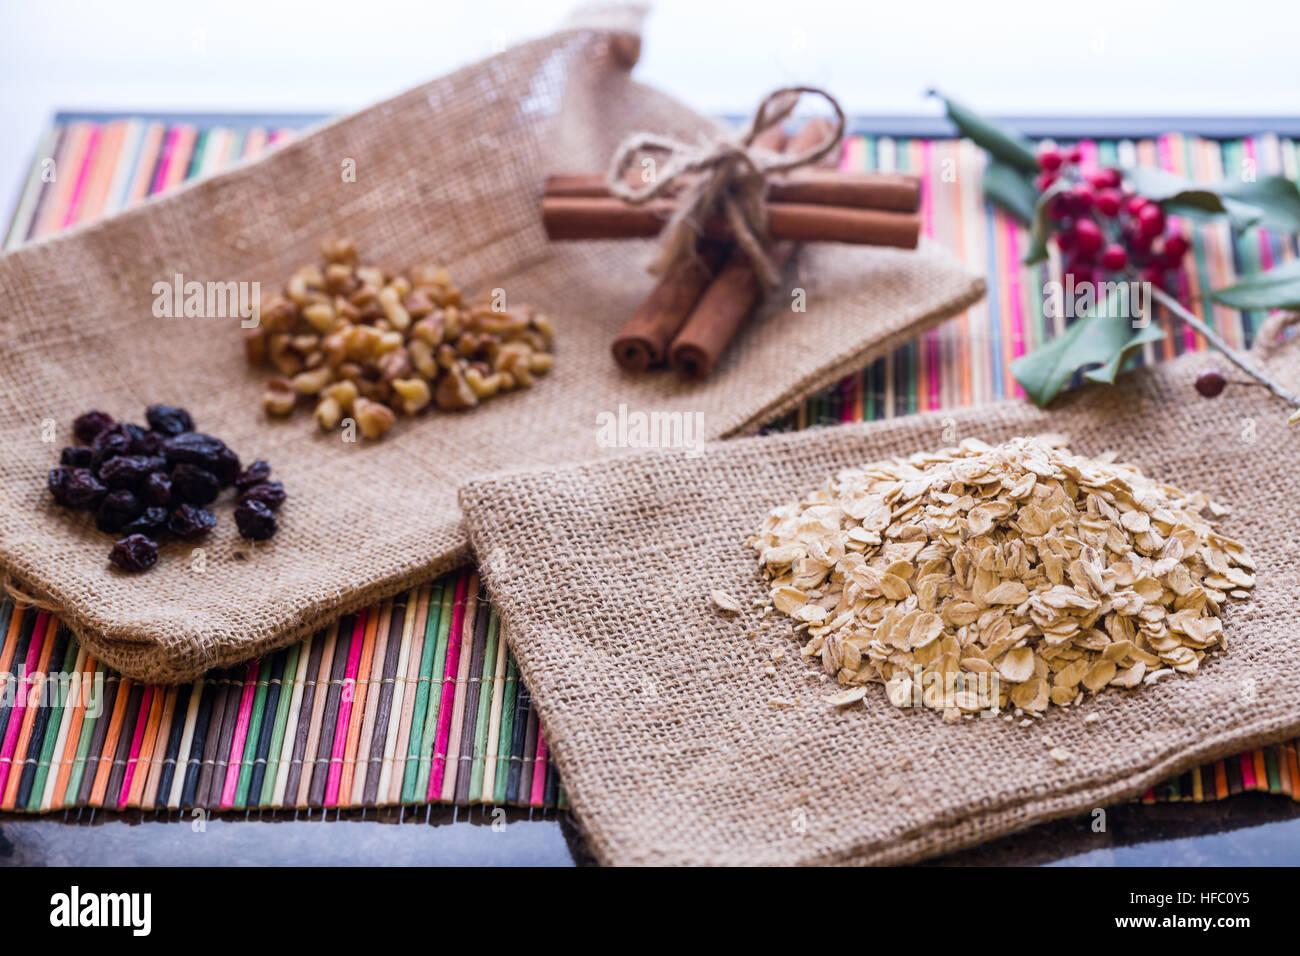 Oatmeal with raisins, walnuts, and cinnamon sticks. Stock Photo